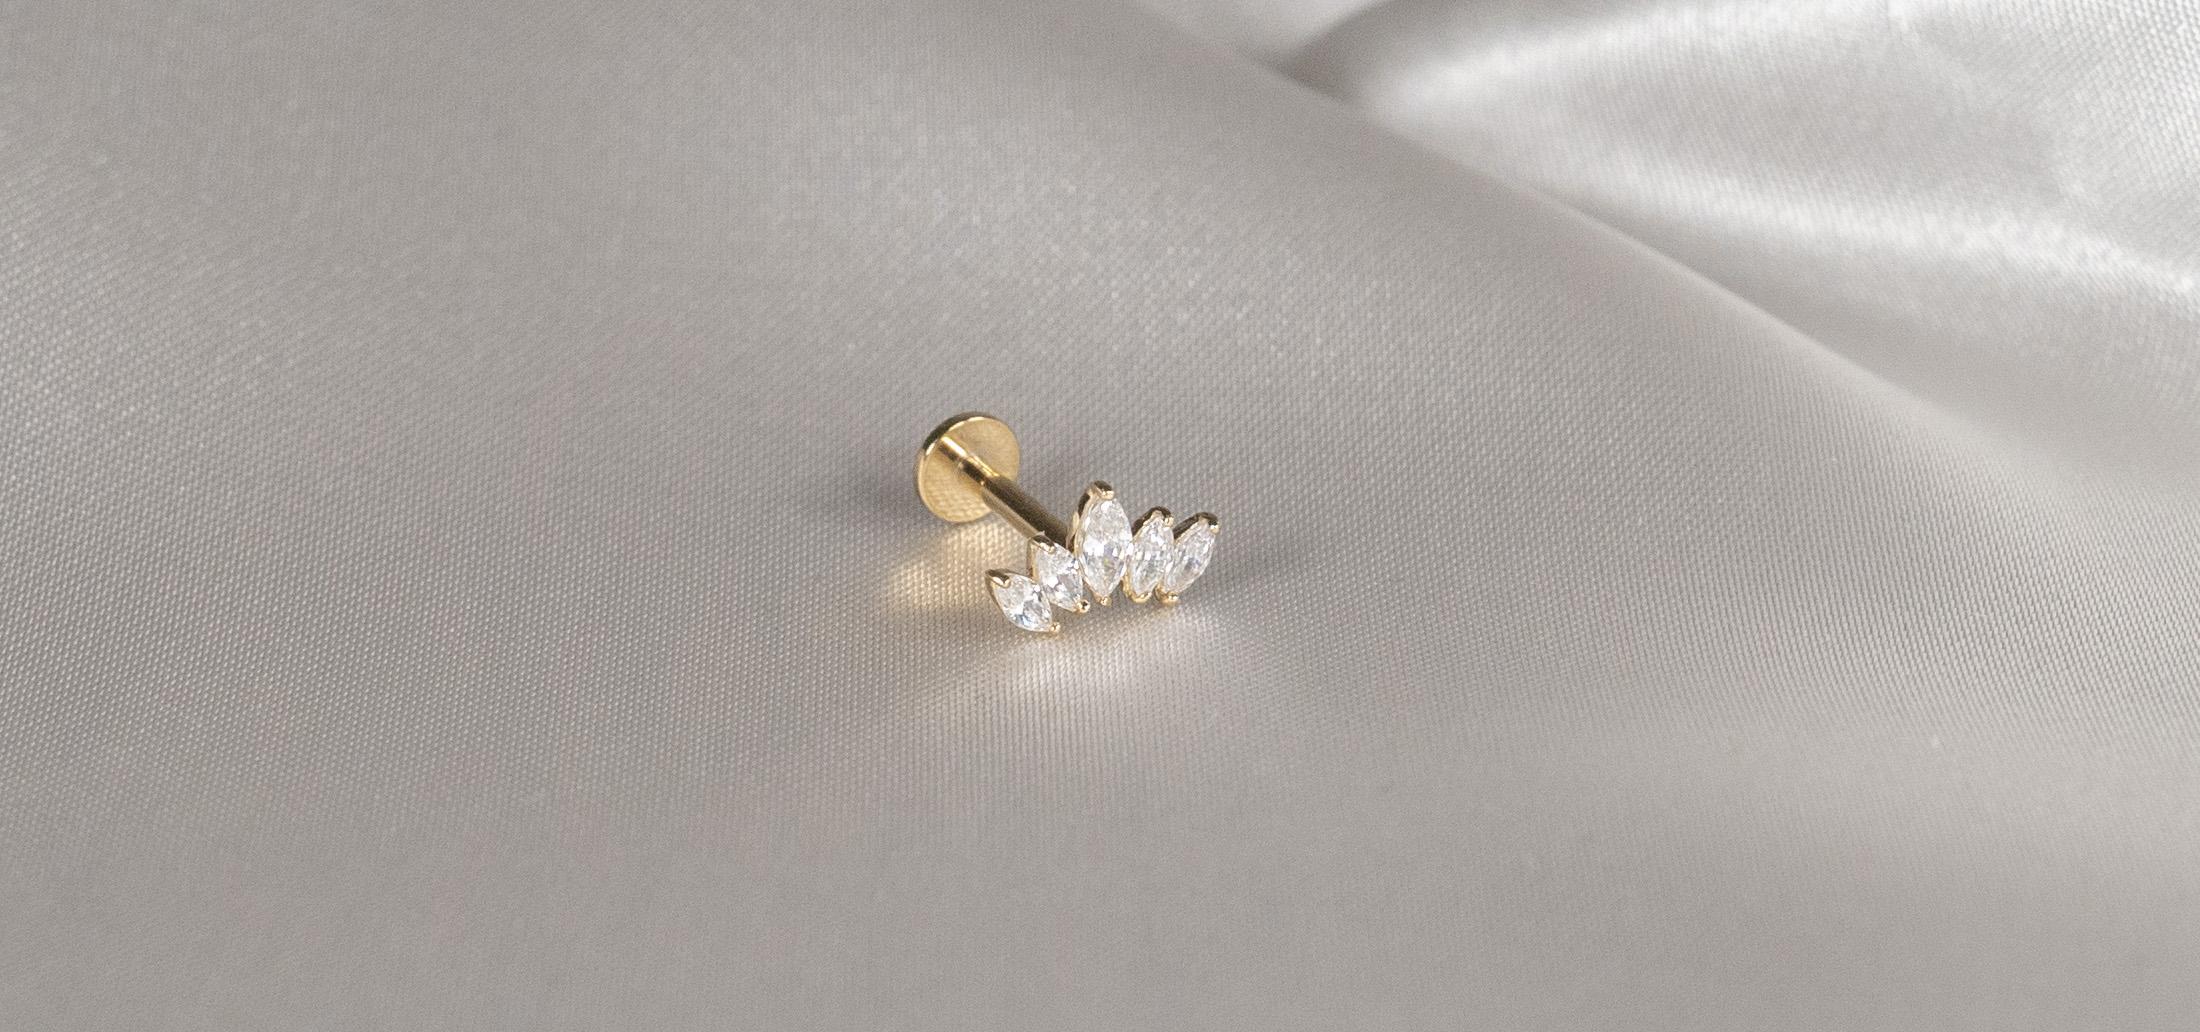 14k Solid Gold 5 Gem Tiara - Bella Andrea Piercing Jewellery